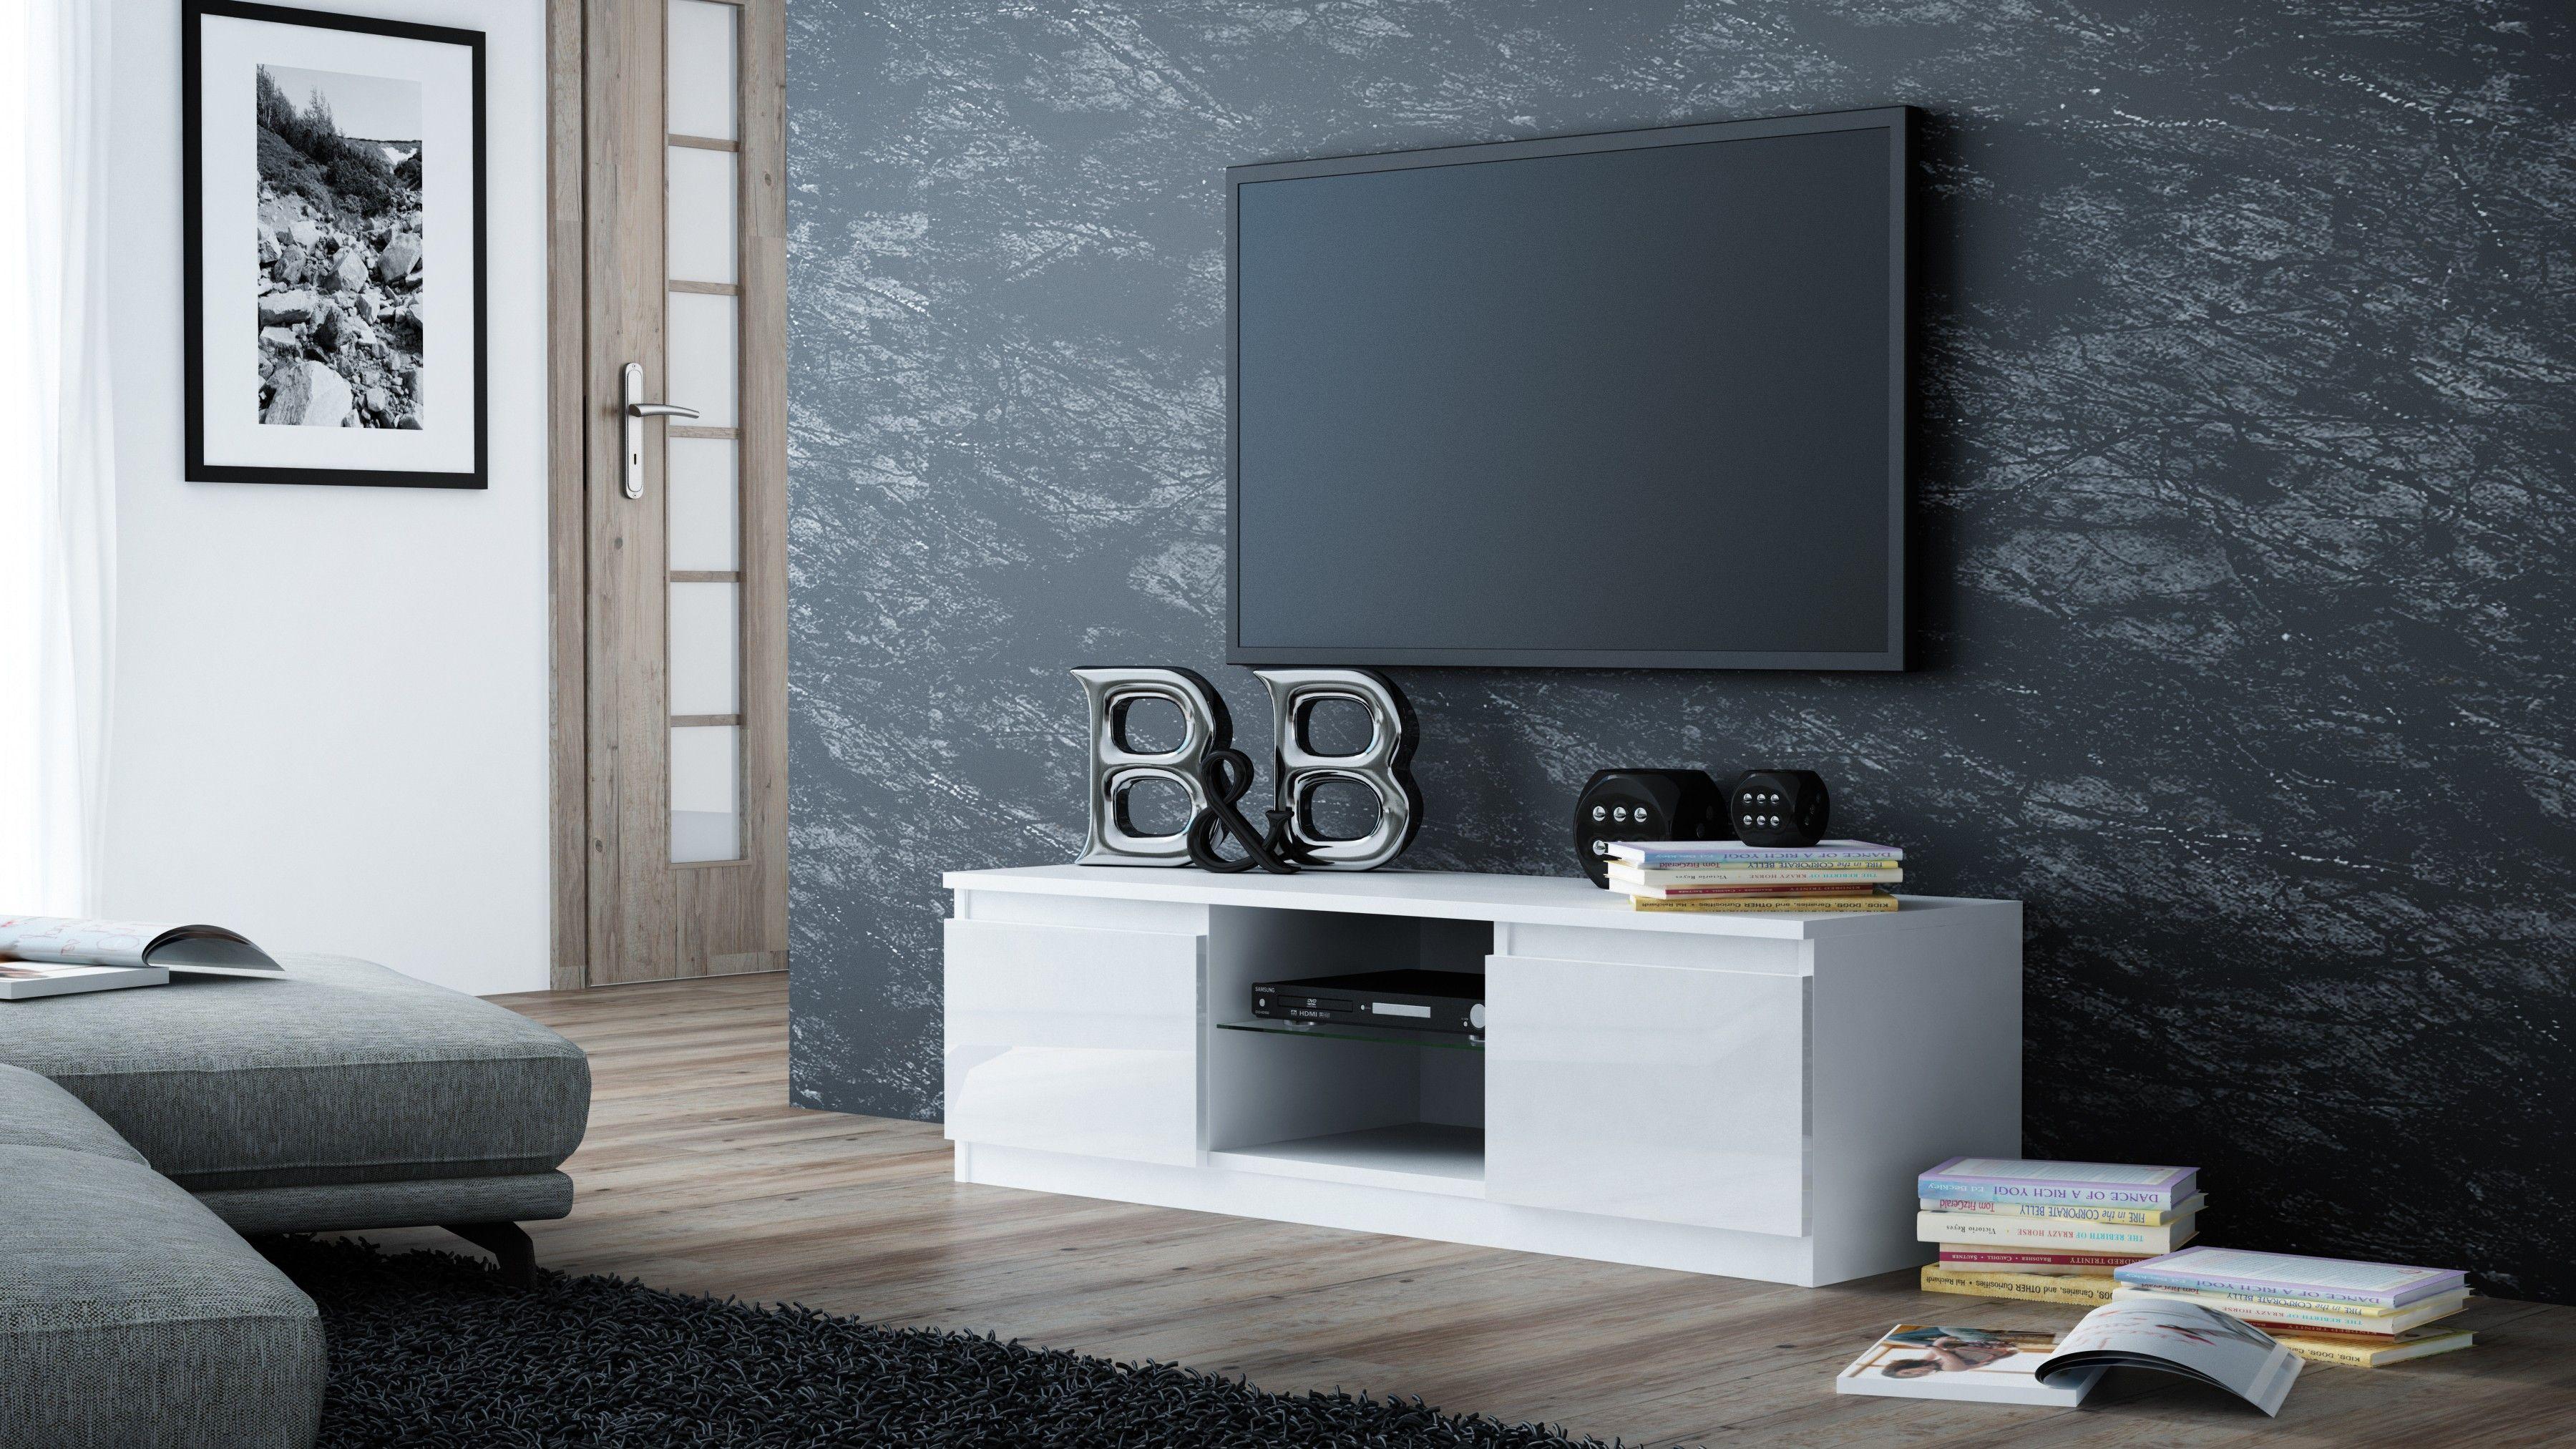 TopEshop Coffee table cabinet rtv 140cm white varnish gloss pane RTV140 BIEL P SZ